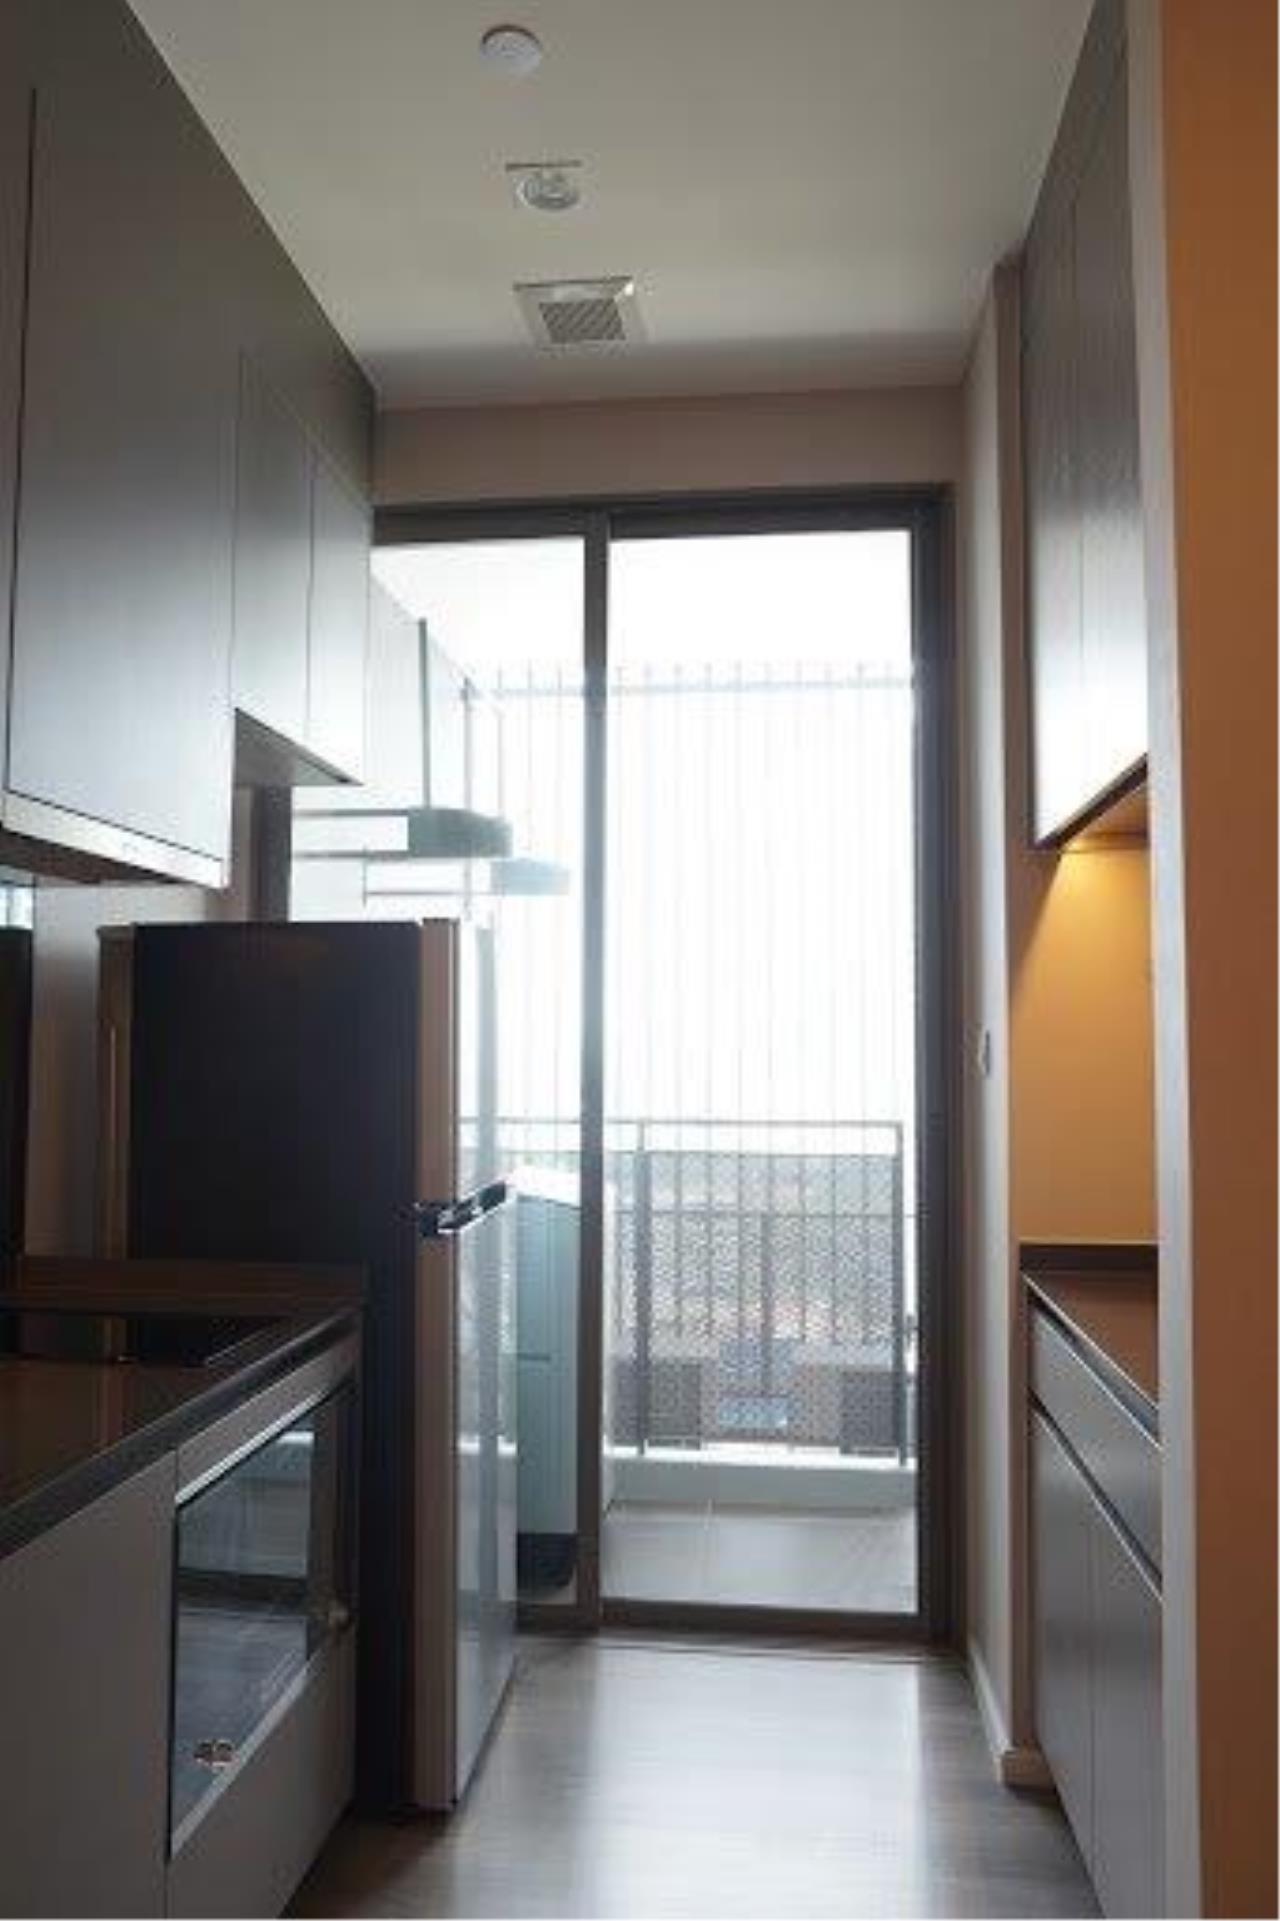 Century21 Skylux Agency's The Room Sukhumvit 69 / Condo For Sale / 1 Bedroom / 35 SQM / BTS Phra Khanong / Bangkok 7